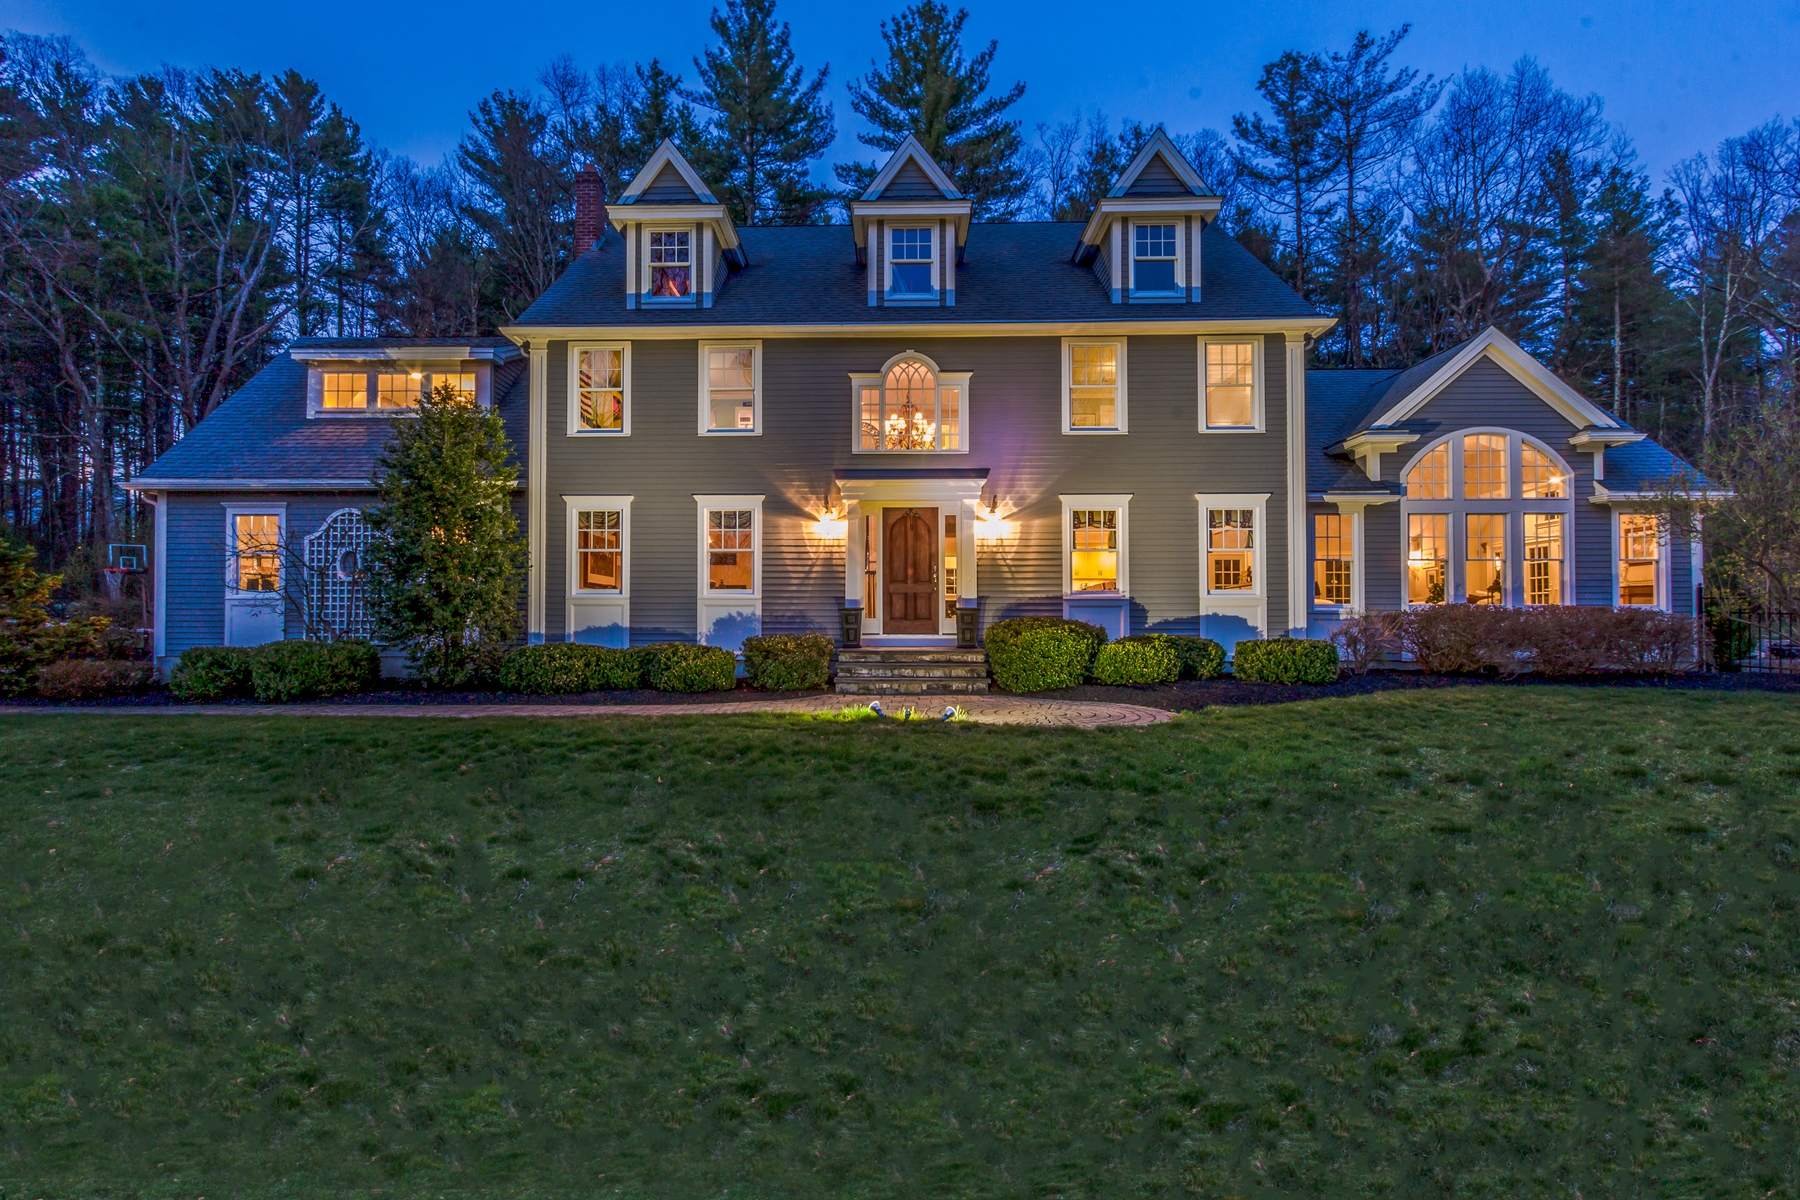 独户住宅 为 销售 在 Elegant Colonial on Private Lot 14 Plumbley Road 厄普顿, 马萨诸塞州 01568 美国